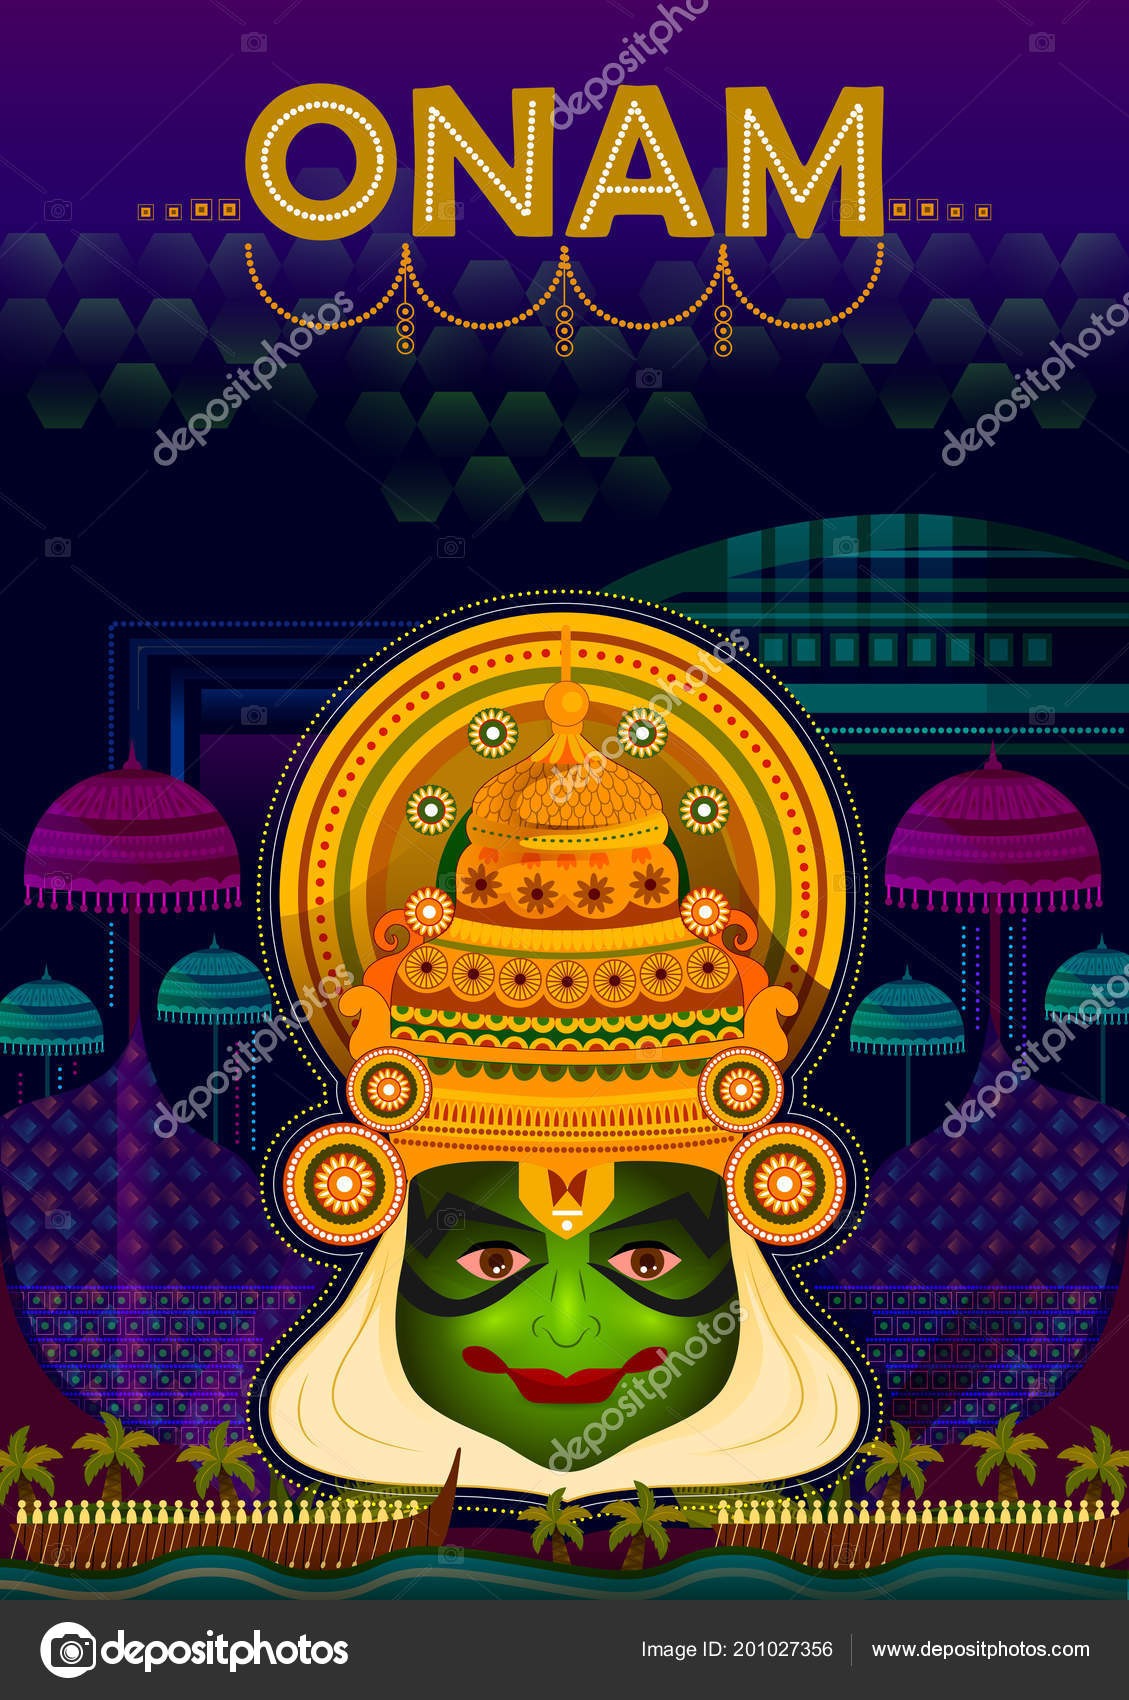 Happy Onam Festival Greetings To Mark The Annual Hindu Festival Of